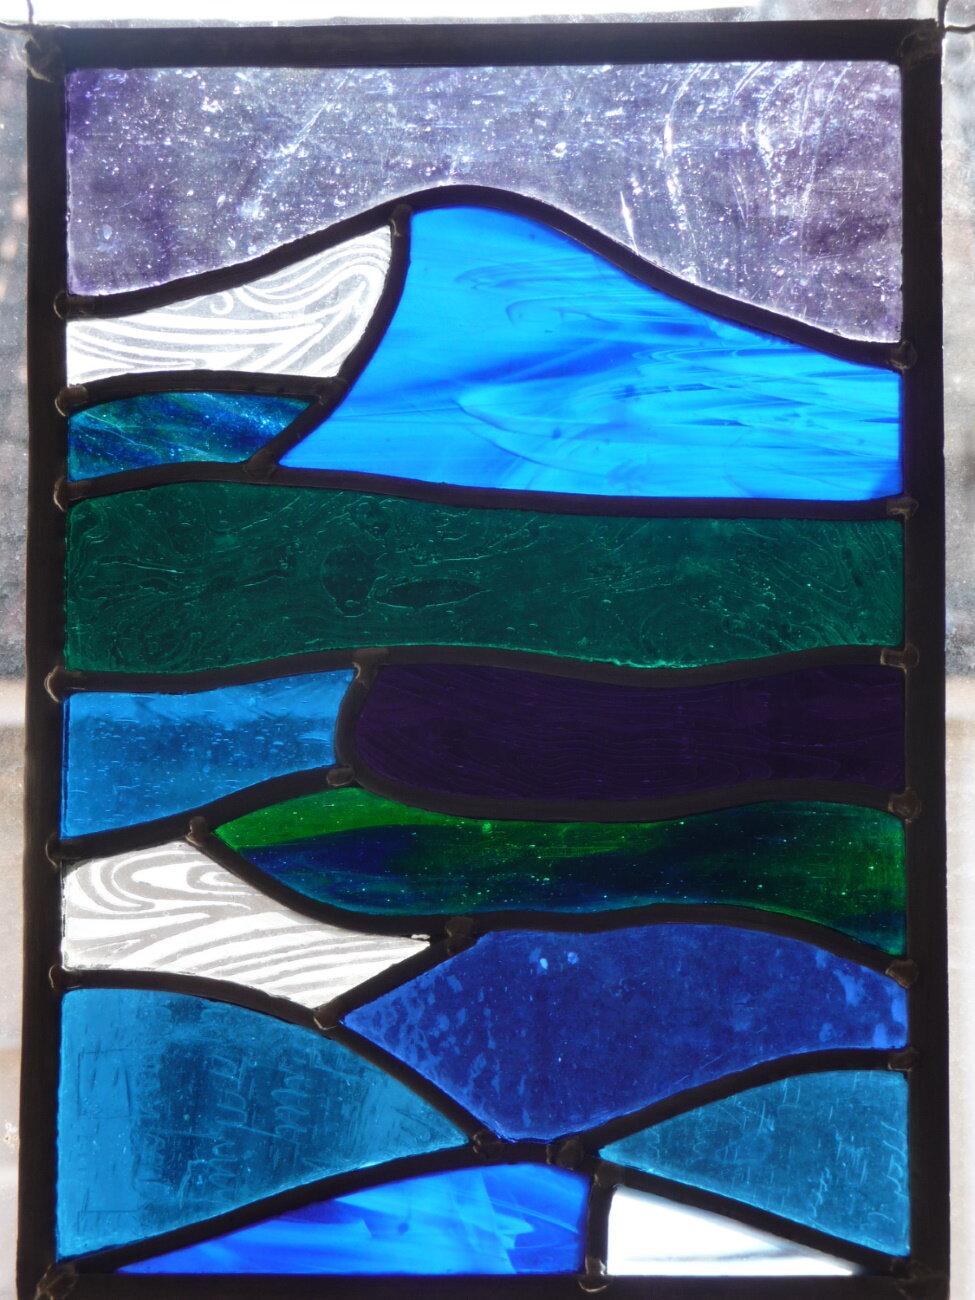 eva-glass-design-blue-green-seascape-stained-glass-window.jpg